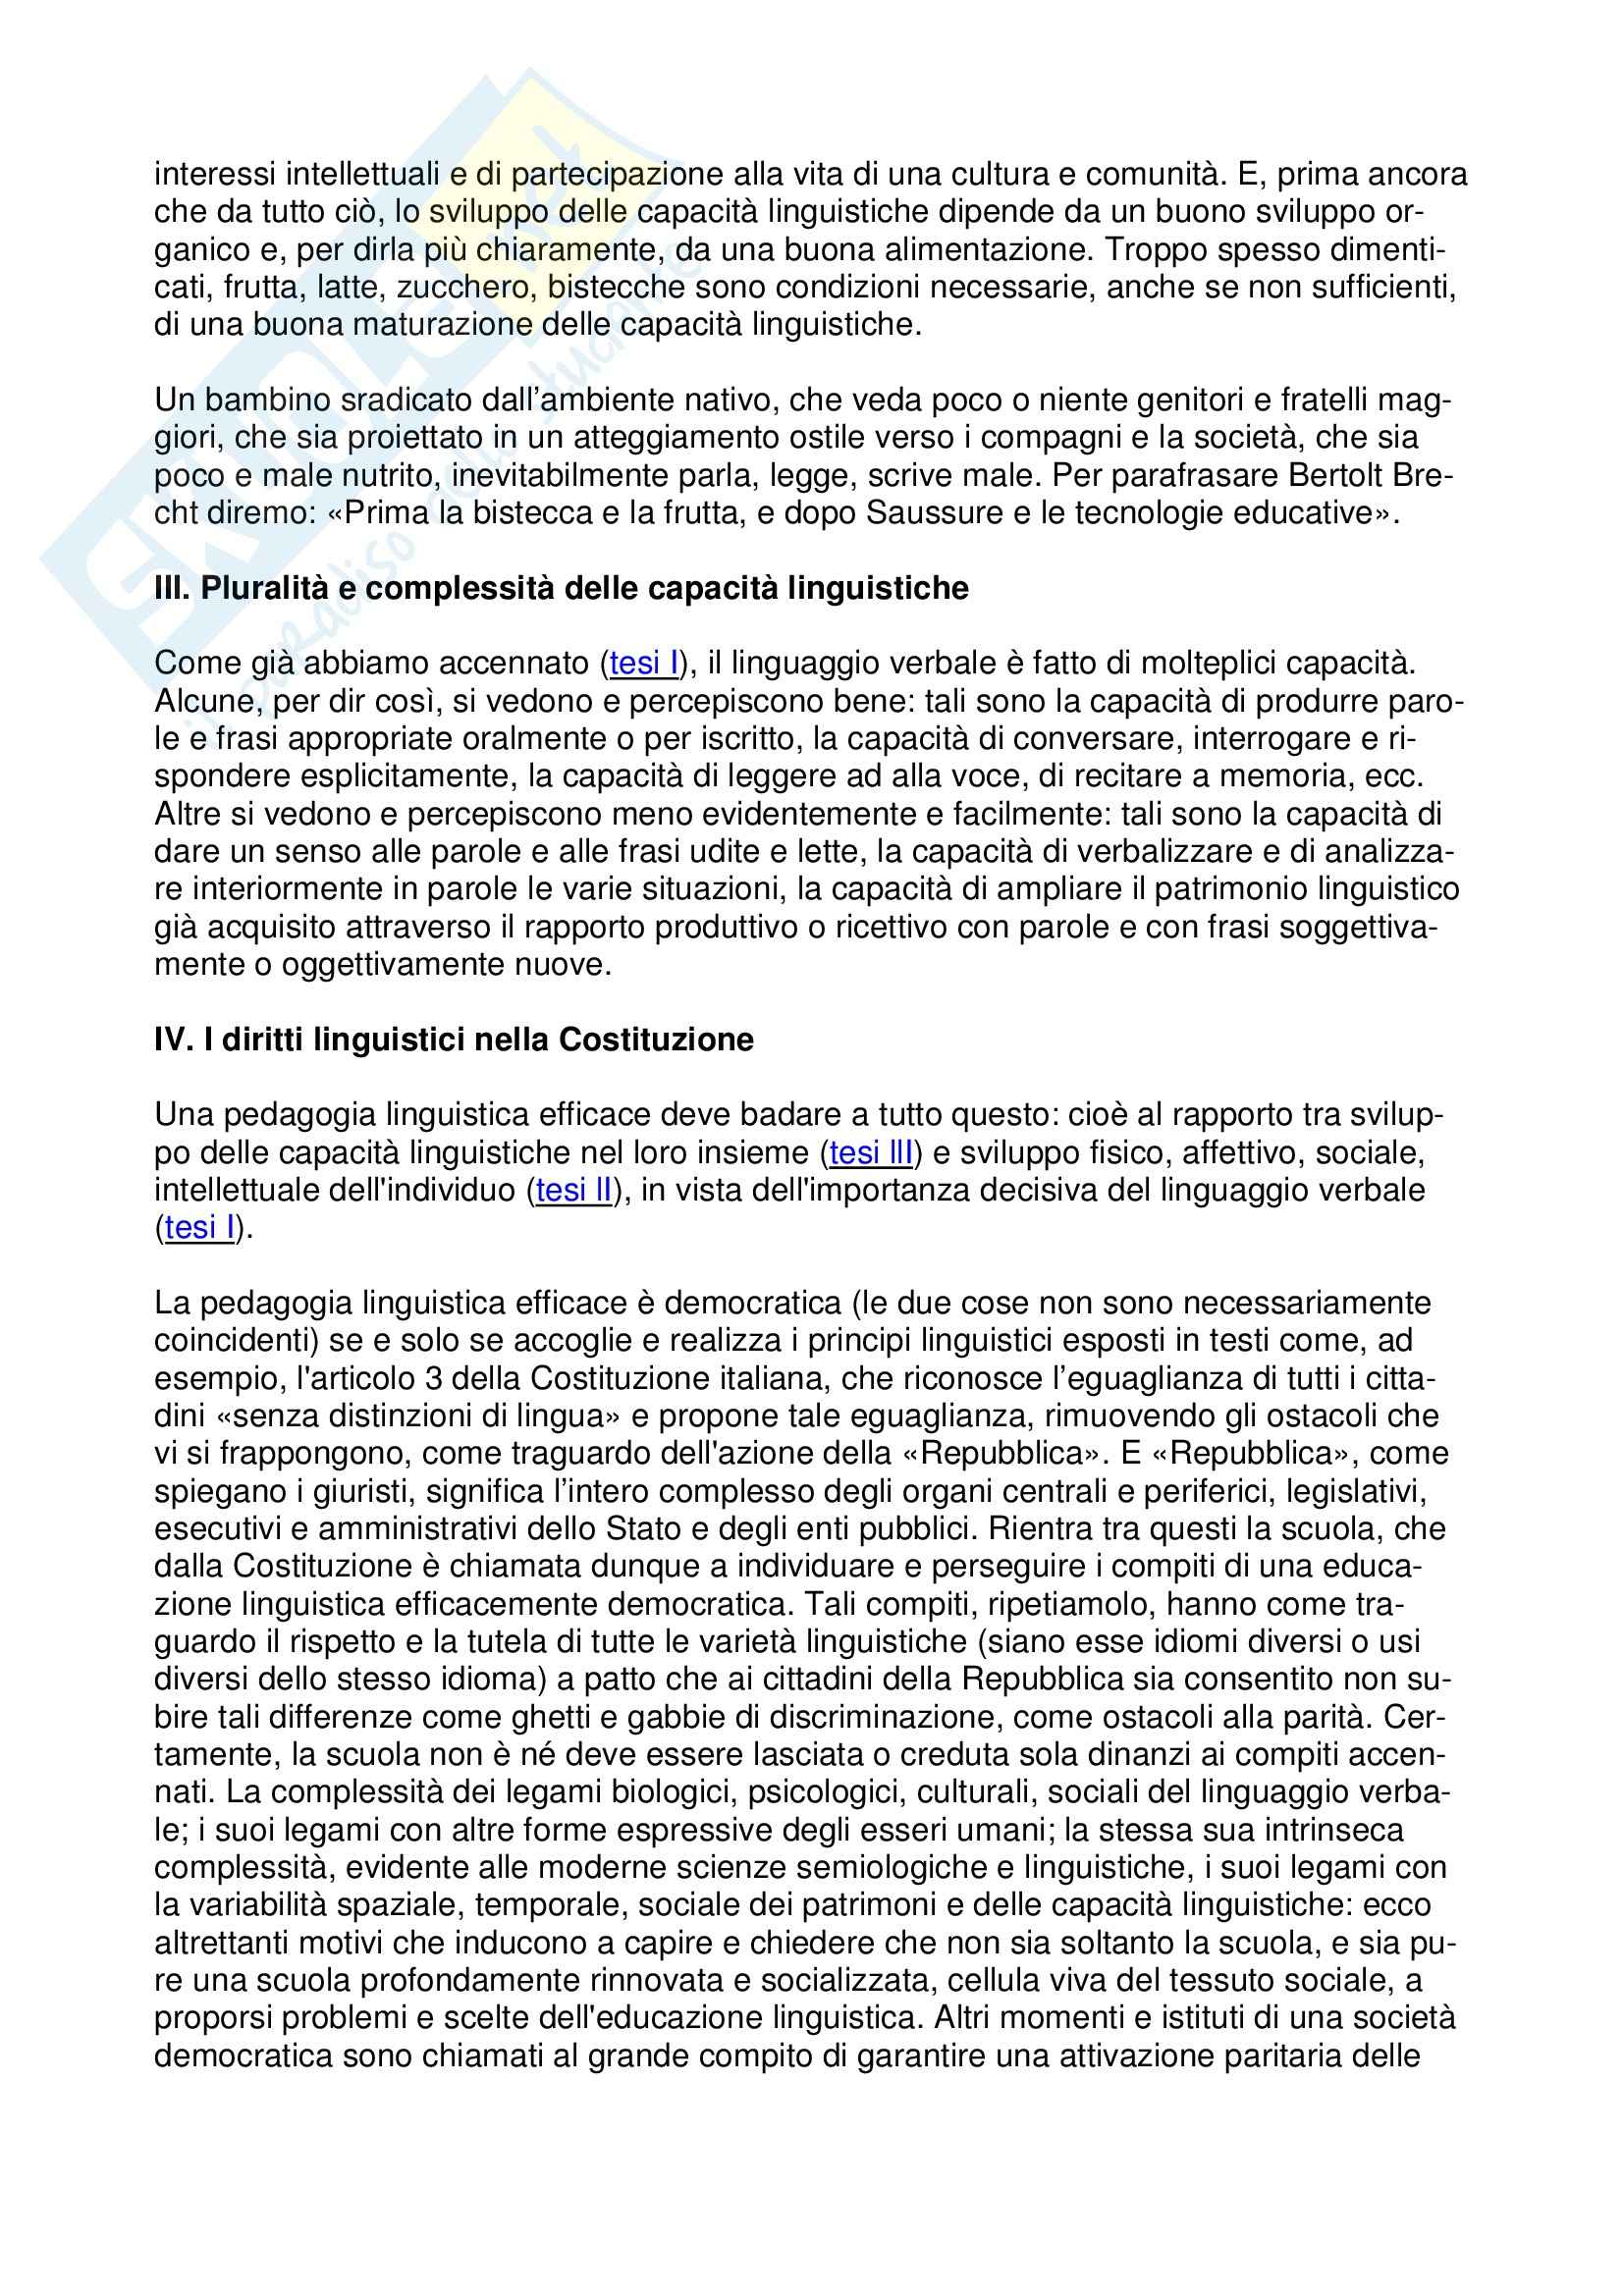 10 tesi per l'educazione linguistica democratica Pag. 2